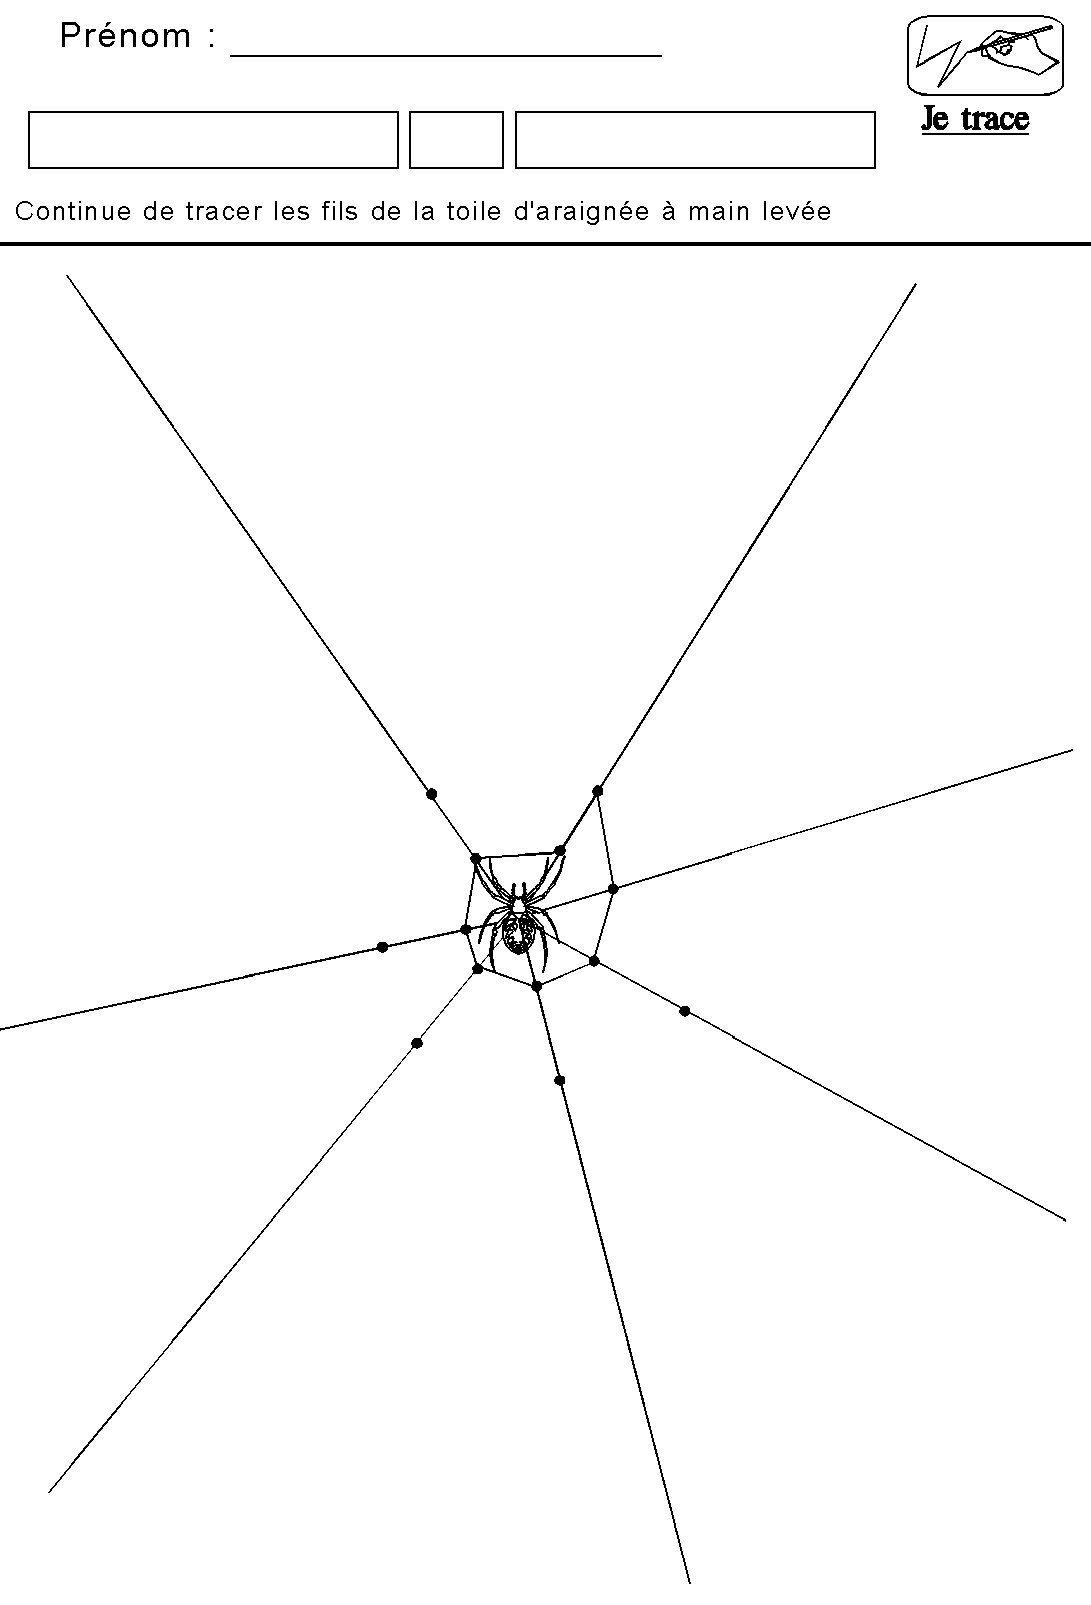 Graphisme | Kleurplaten, Knutselideeën, Papier destiné Dessin Toile Araignée